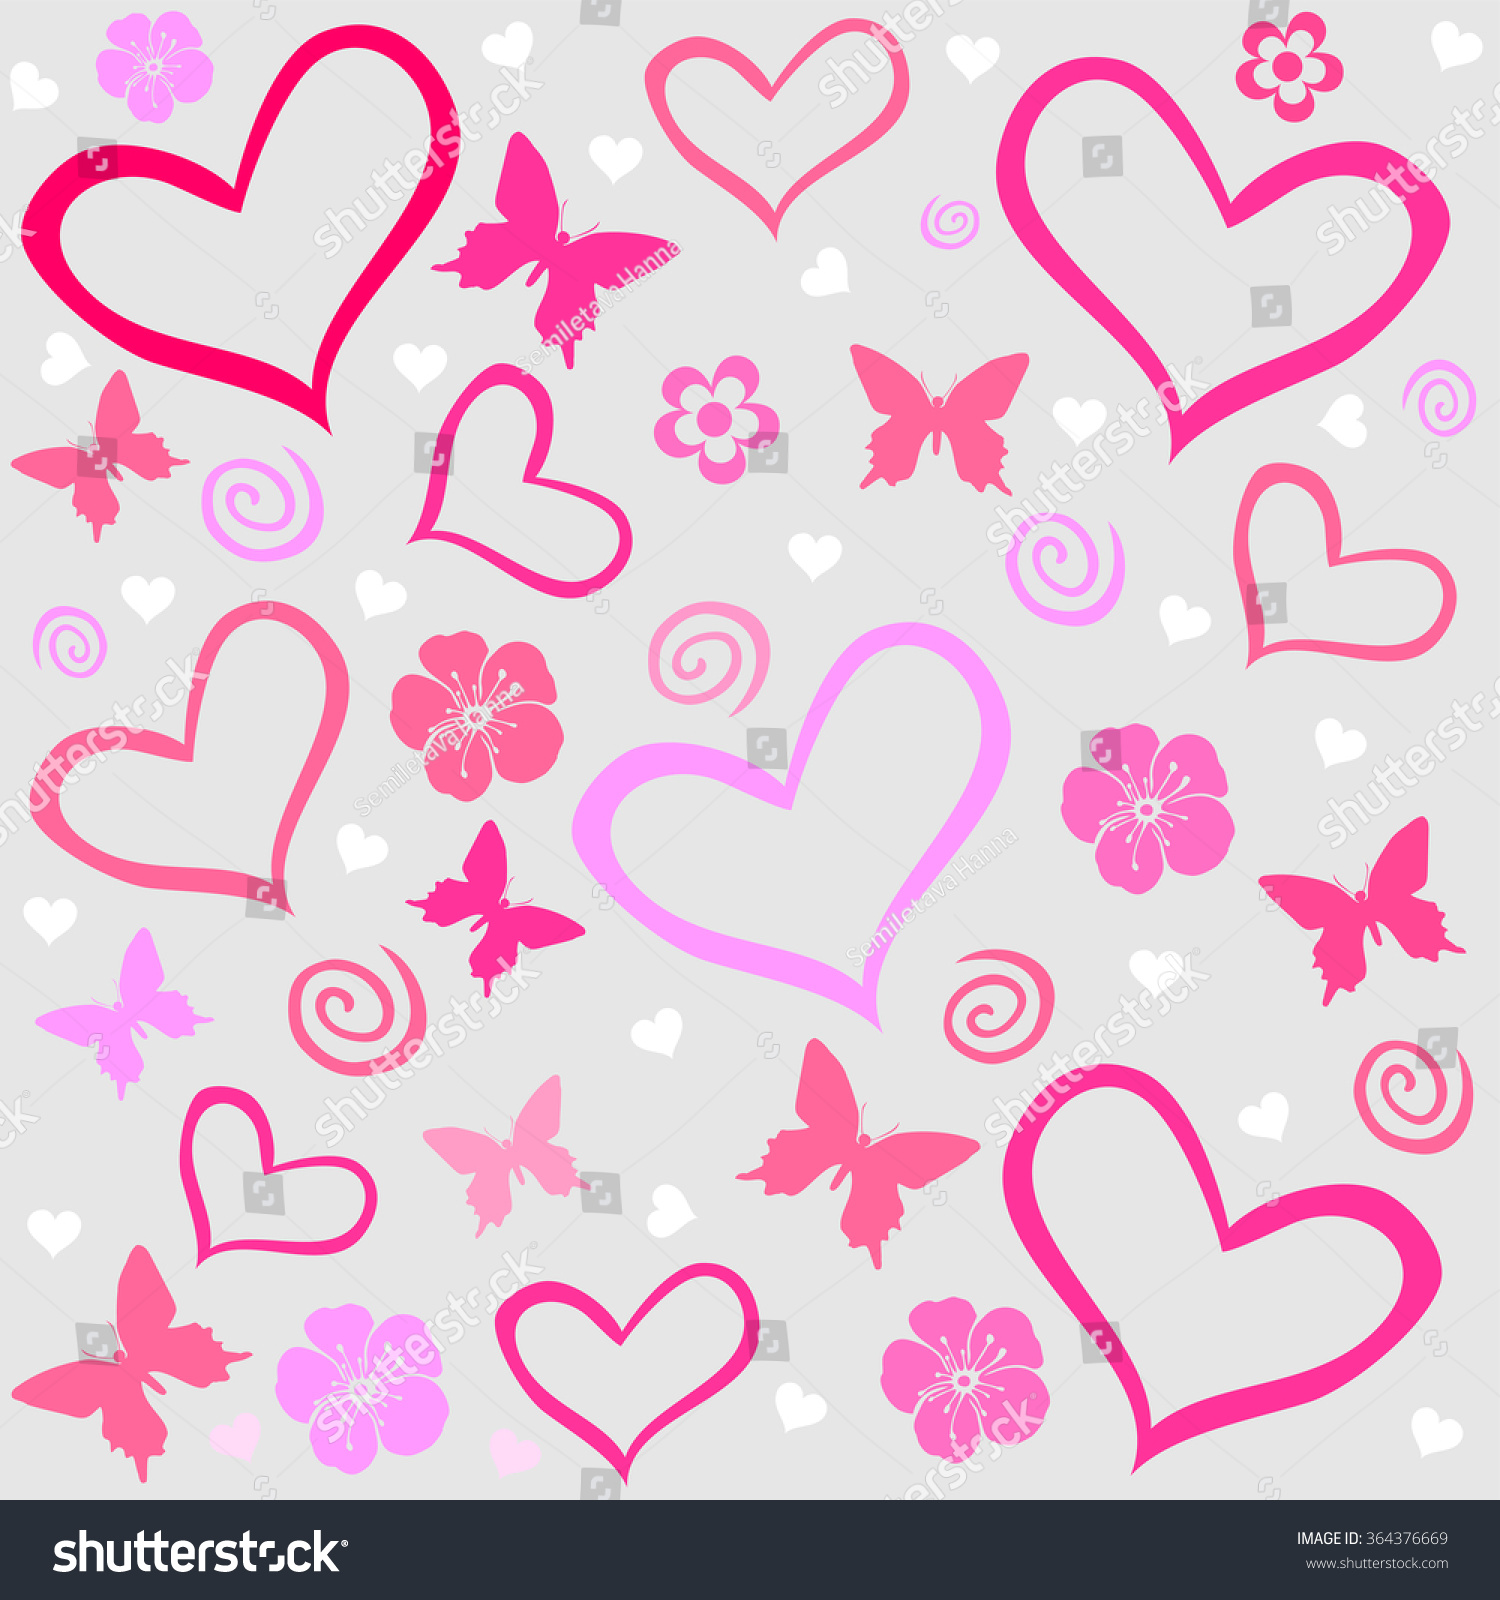 Background Wallpaper Hearts Vector Illustration Stock Vector ...